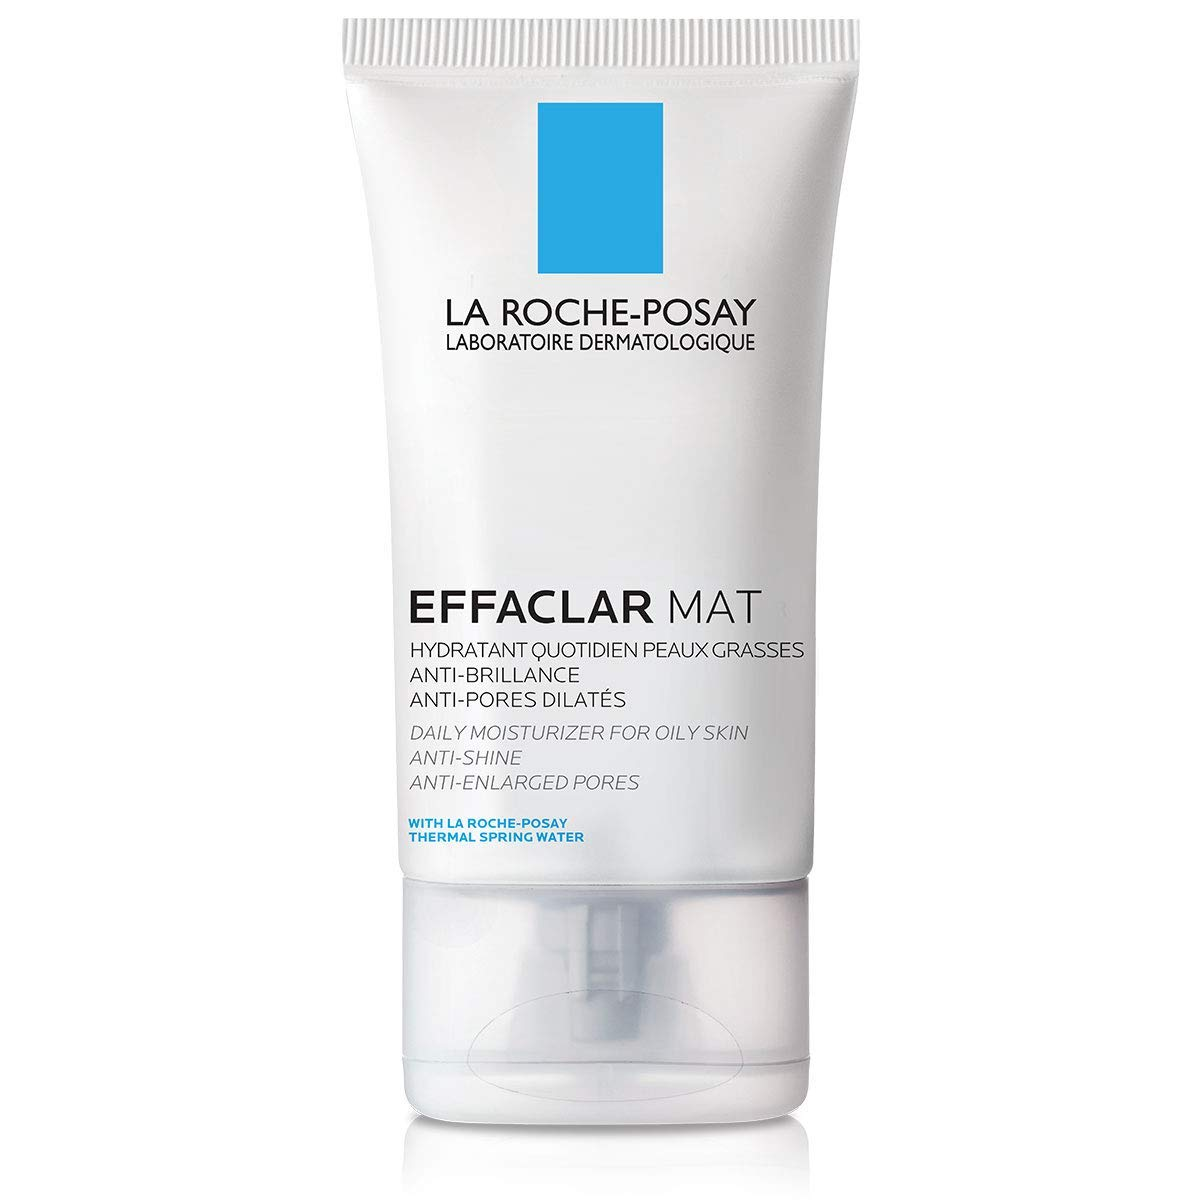 Effaclar Mat Moisturizer by La Roche Posay